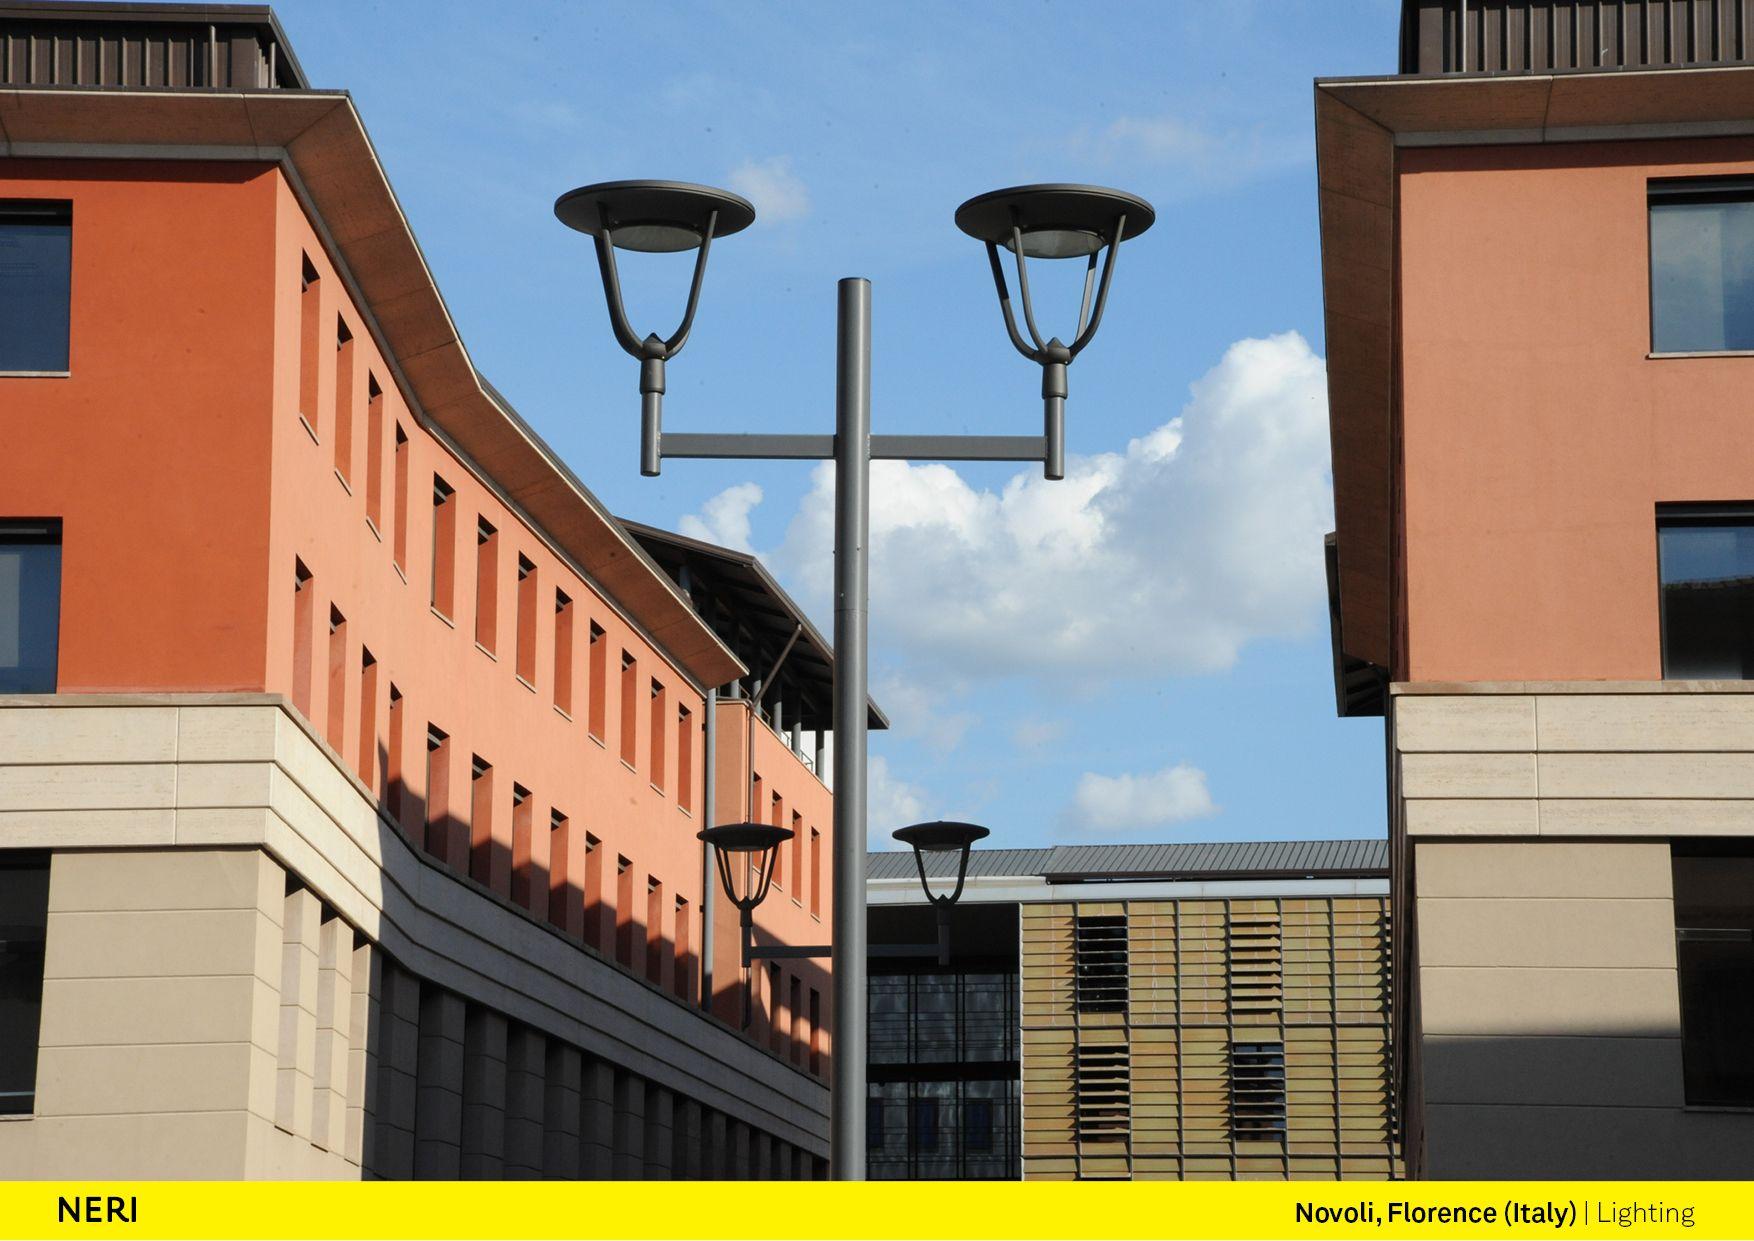 As of 1935, Novoli was the chosen site for FIAT production activities firstly in the aeronautics sector, and later in the automobile industry. http://www.neri.biz/en/projects/novoli-firenze.aspx?idC=63059&LN=en-GB #Neri #NeriLighting #Light #LightingDesign #Design #Urbanlight #Madeinitaly #Luce #Lighting #Ispiration #NeriSpa #Florence #Firenze #Tuscany #Toscana #Novoli #Unifi #Followus #Follower #Italy #Outdoorlighting #Lamppost